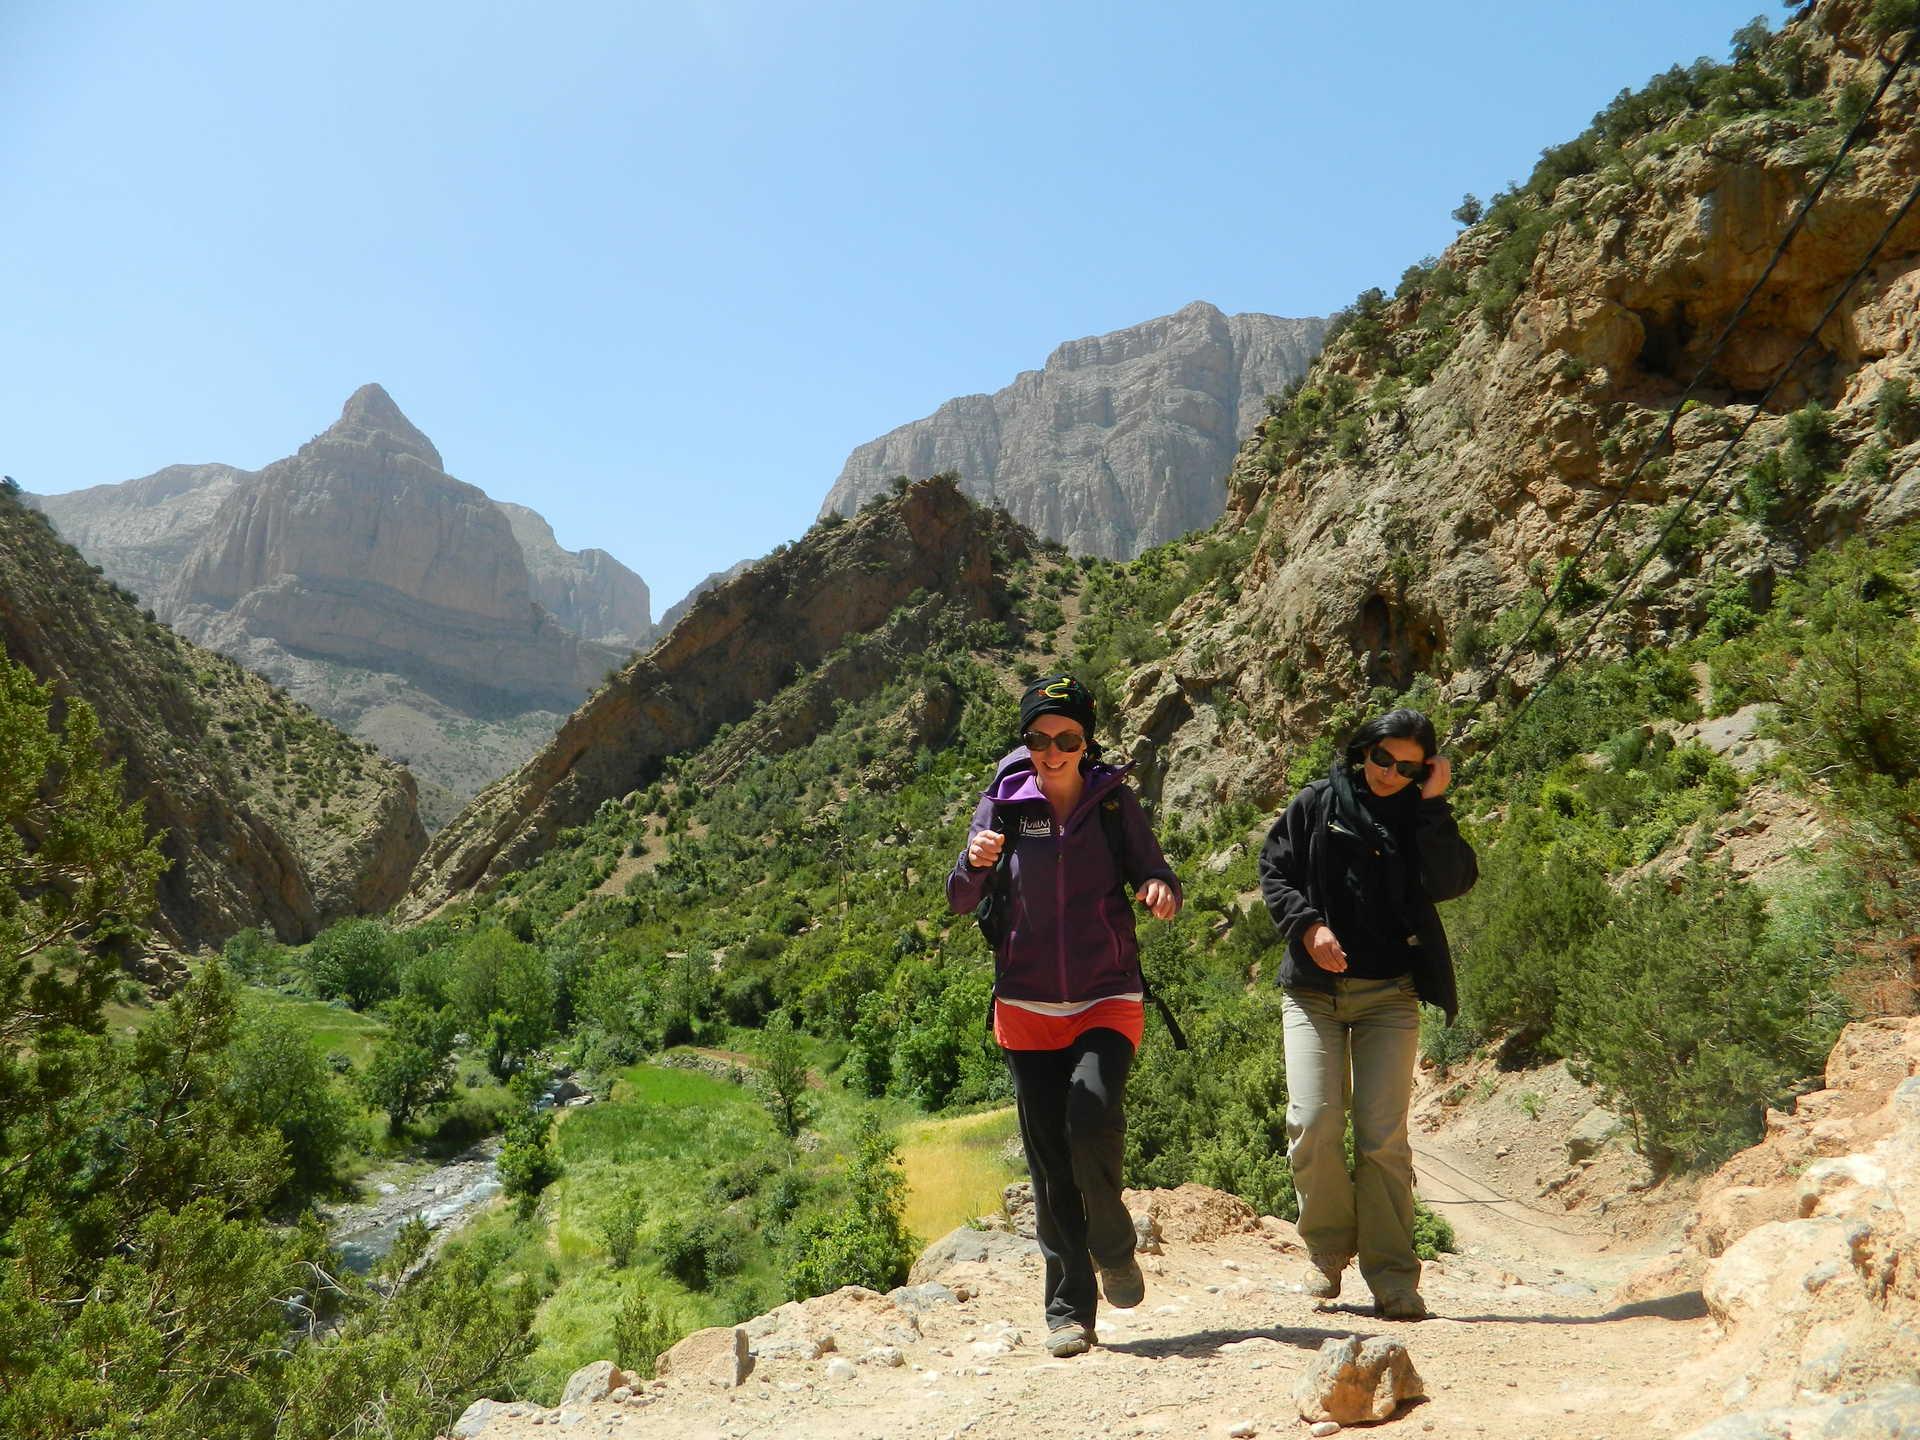 Dolomites marocaines, cirque de Taghia, Maroc